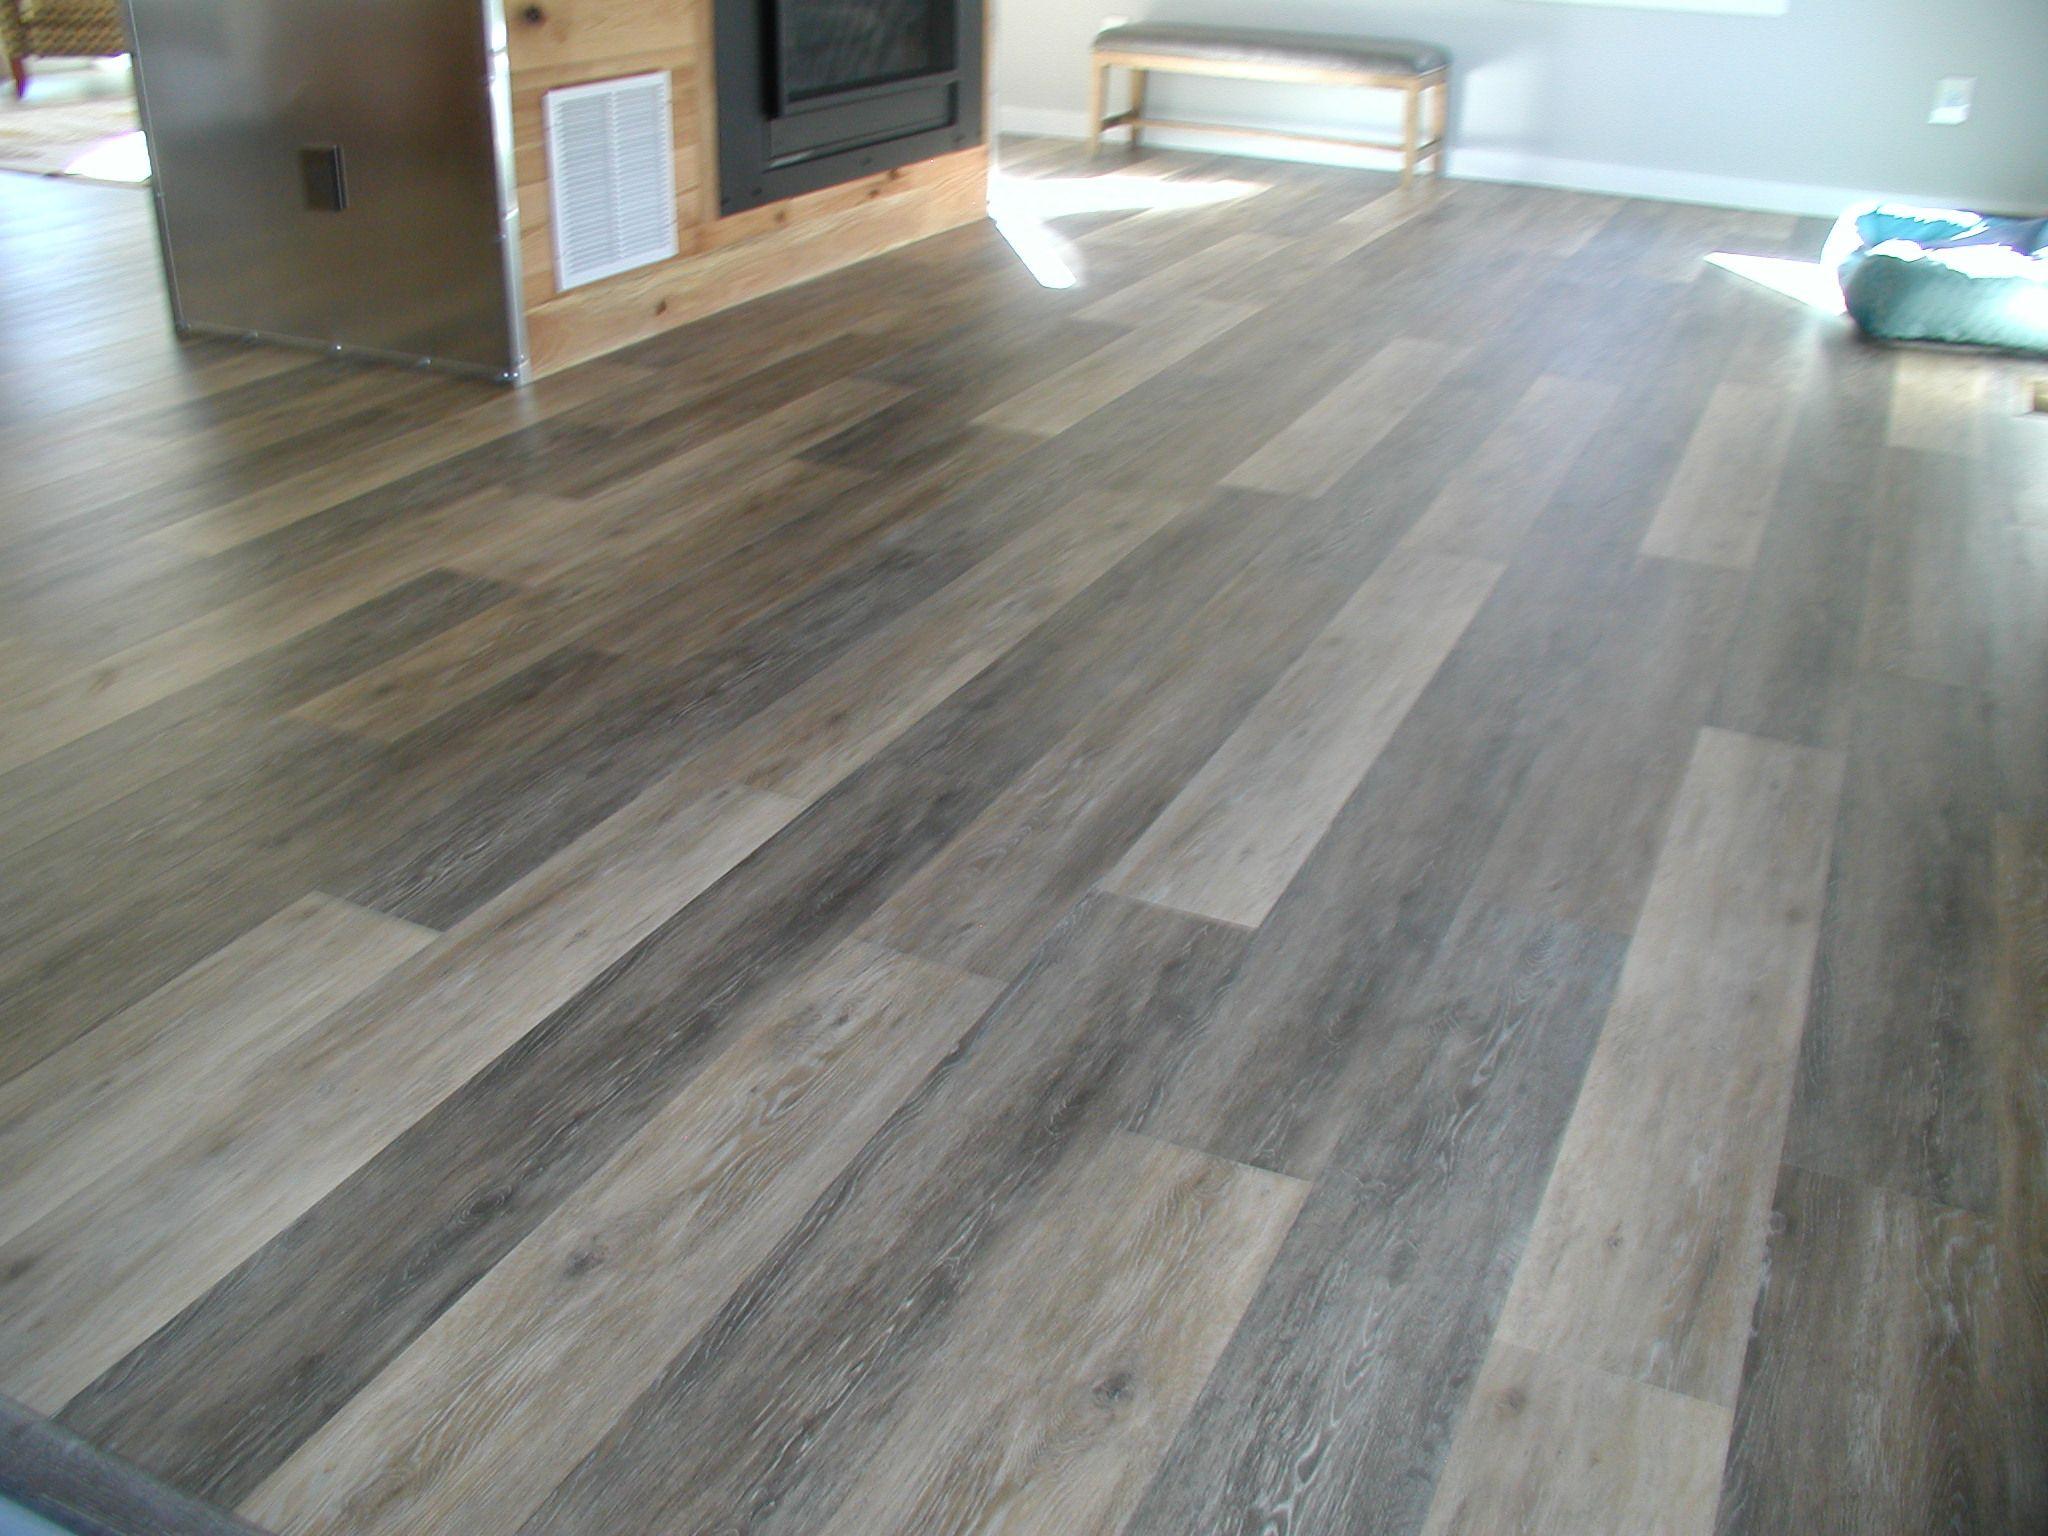 Coretec Vinyl Flooring httpwwwusfloorsllccomproduct